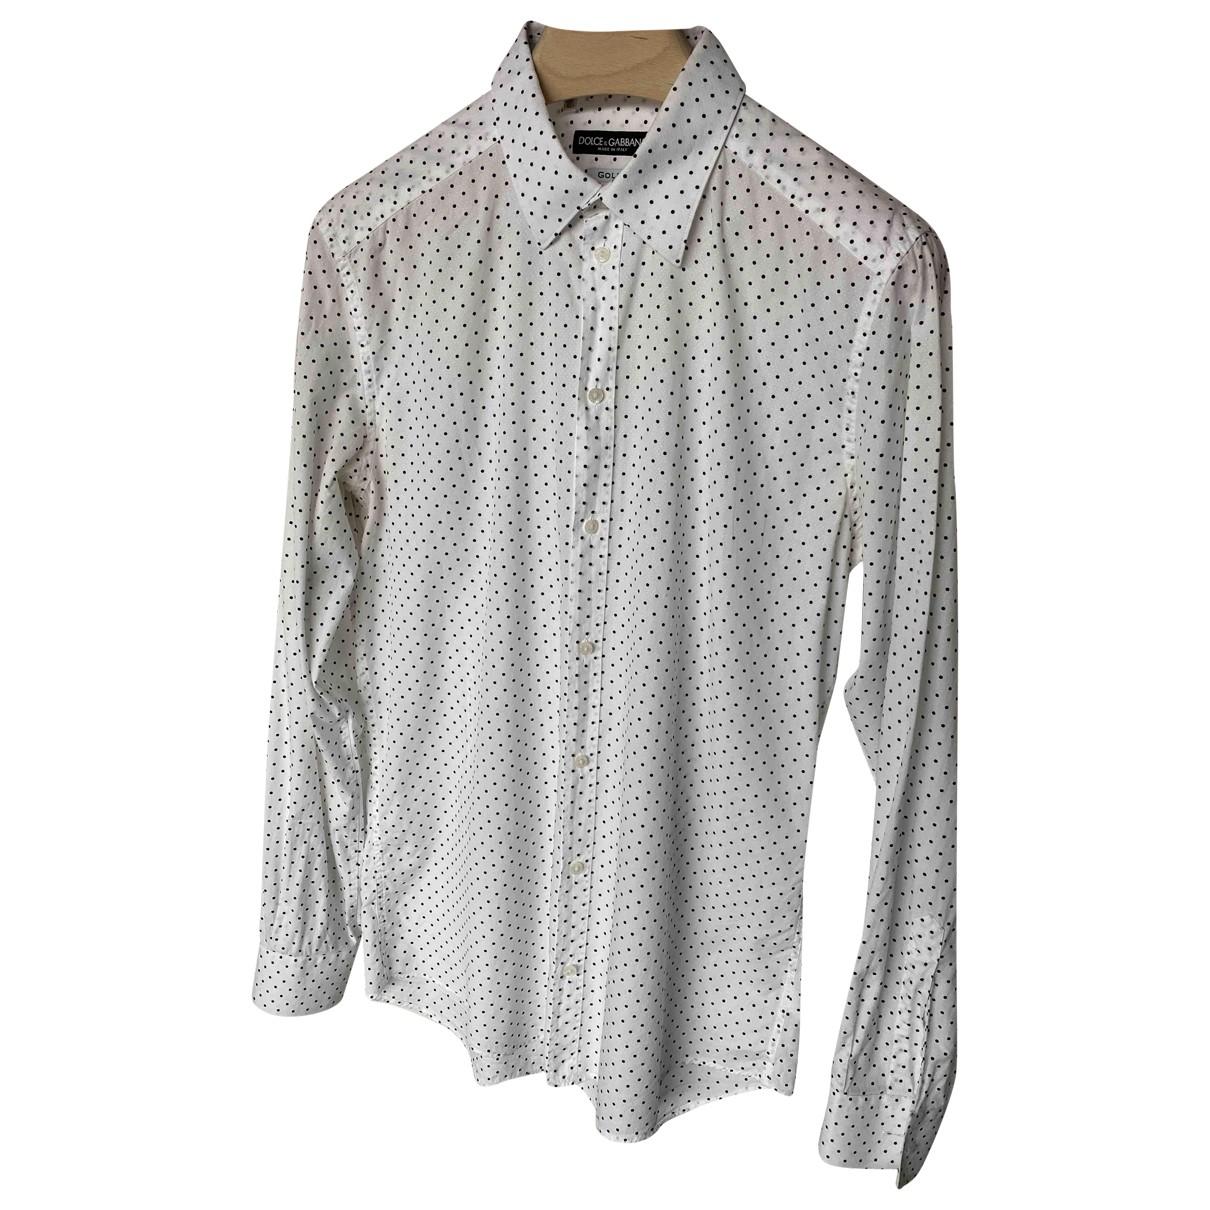 Dolce & Gabbana N White Cotton Shirts for Men 41 EU (tour de cou / collar)